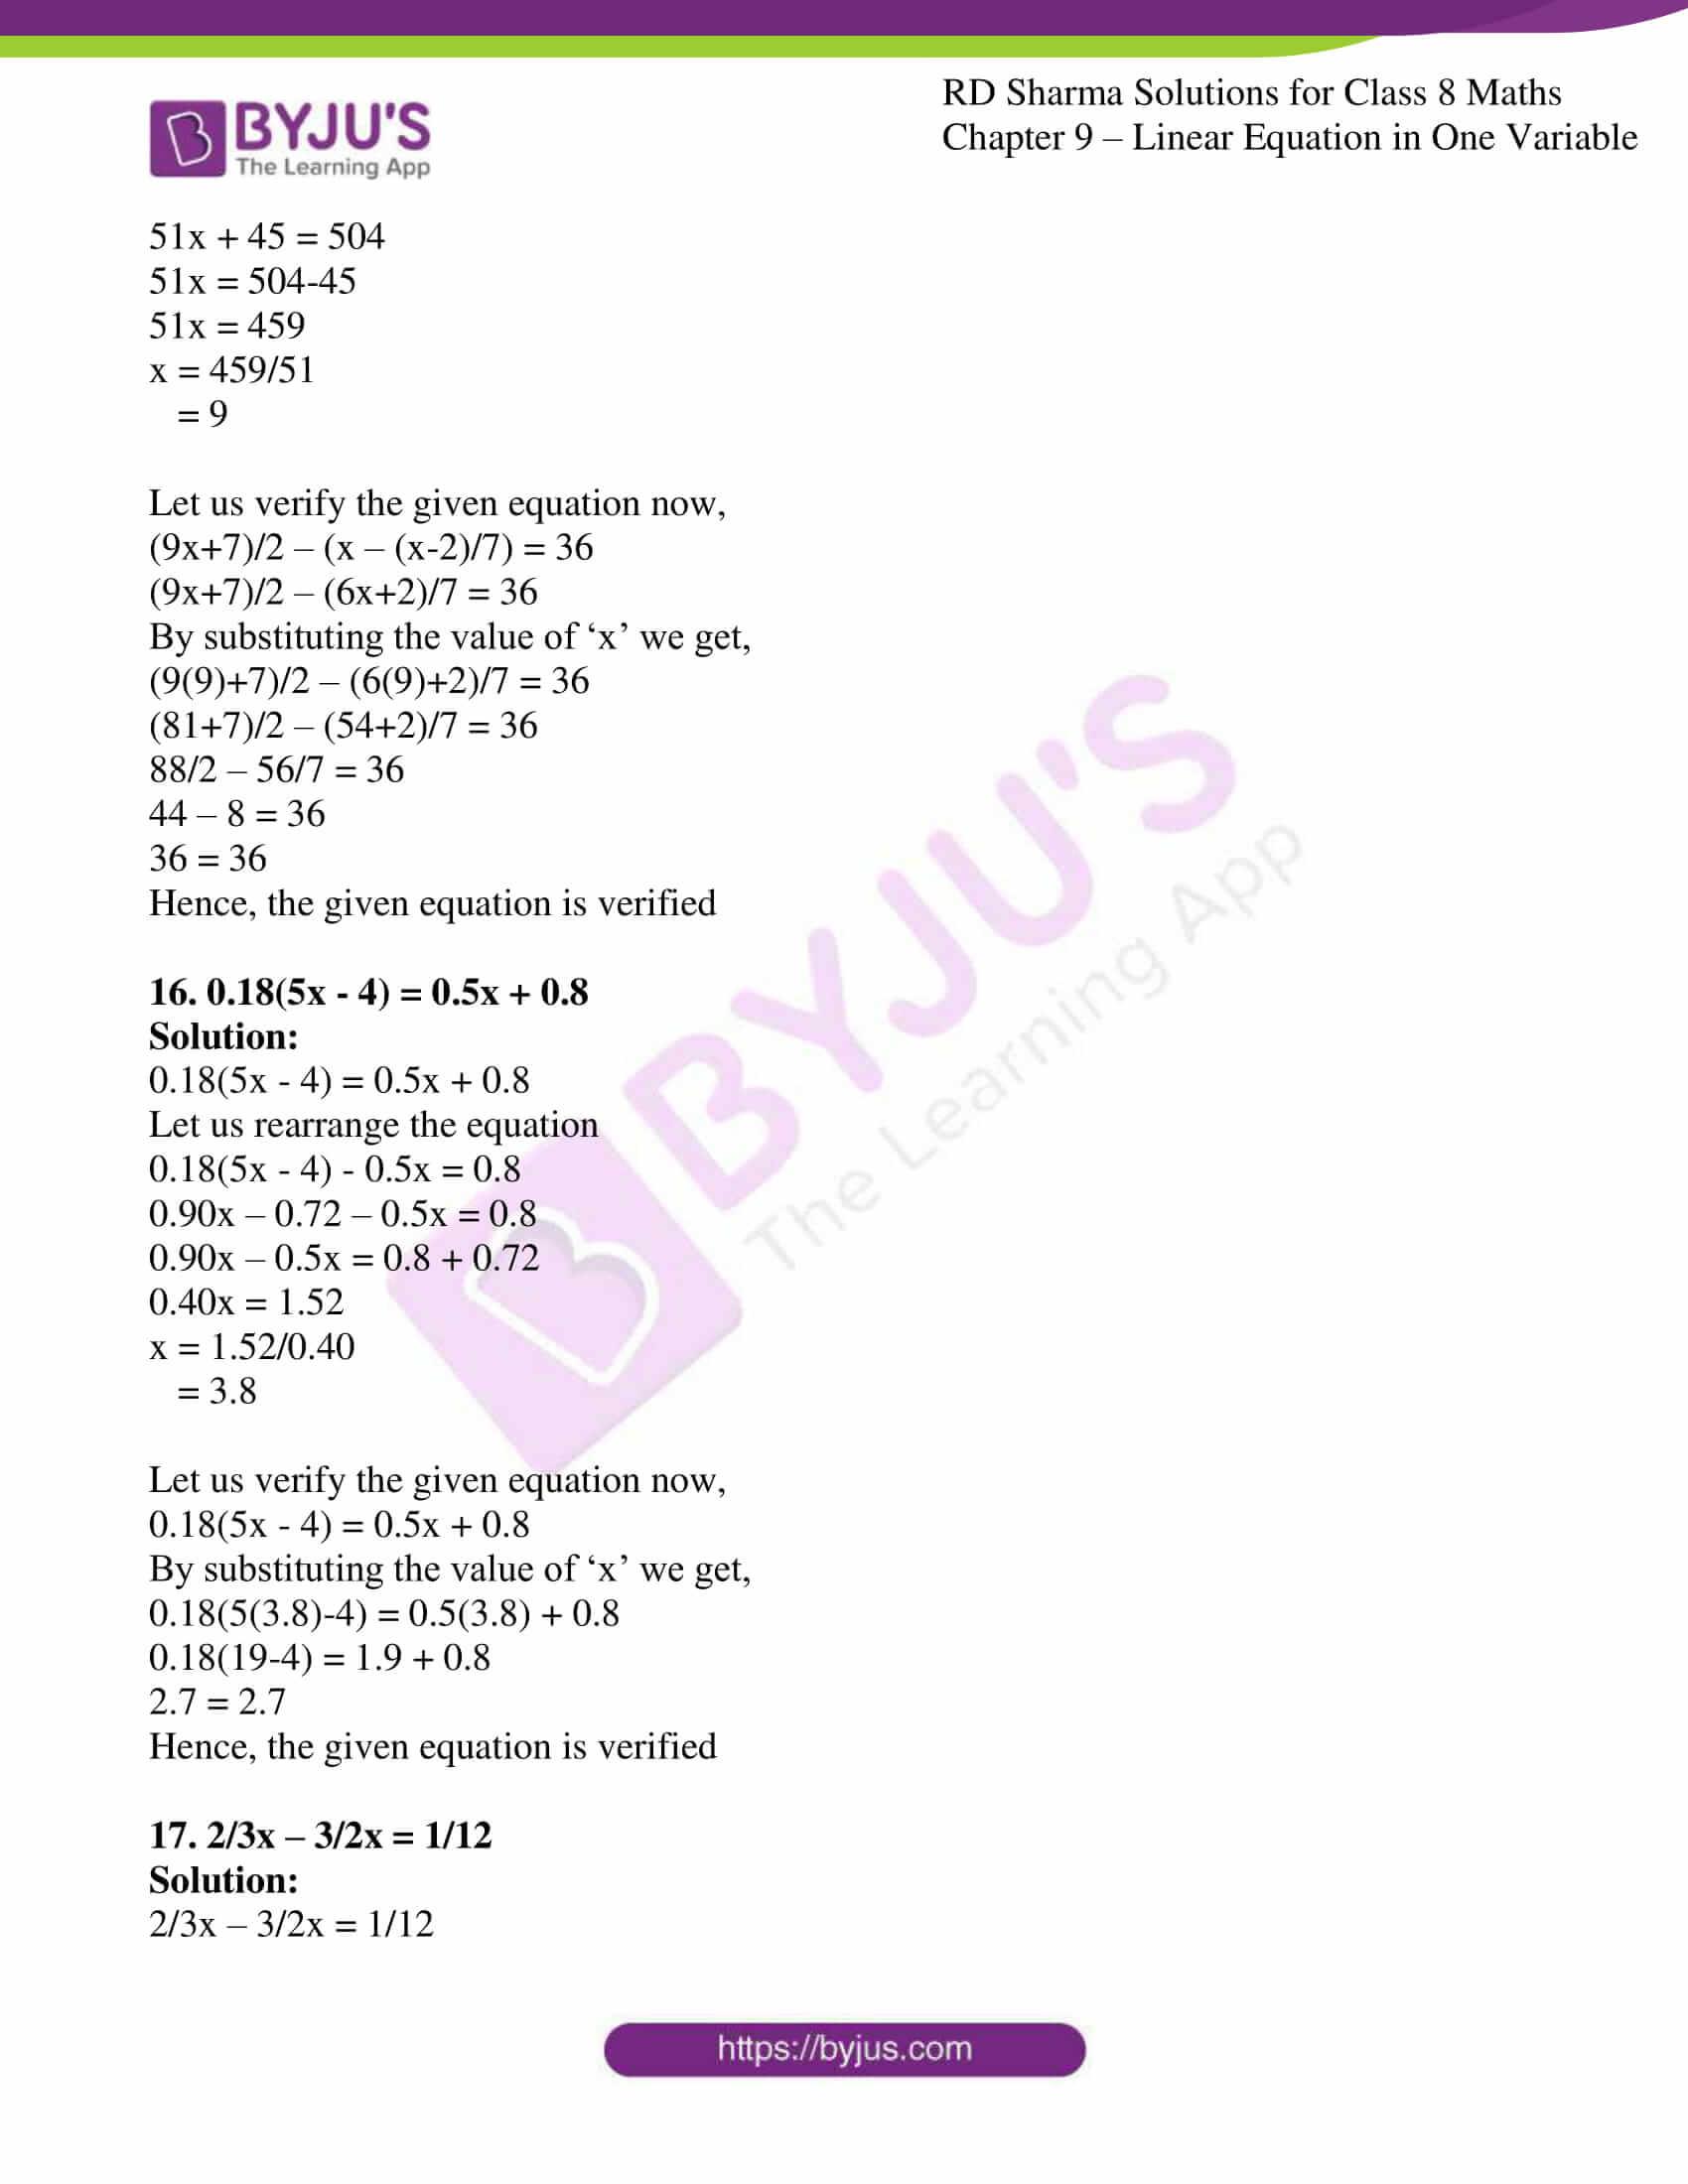 rd sharma class 8 maths chapter 9 exercise 2 10